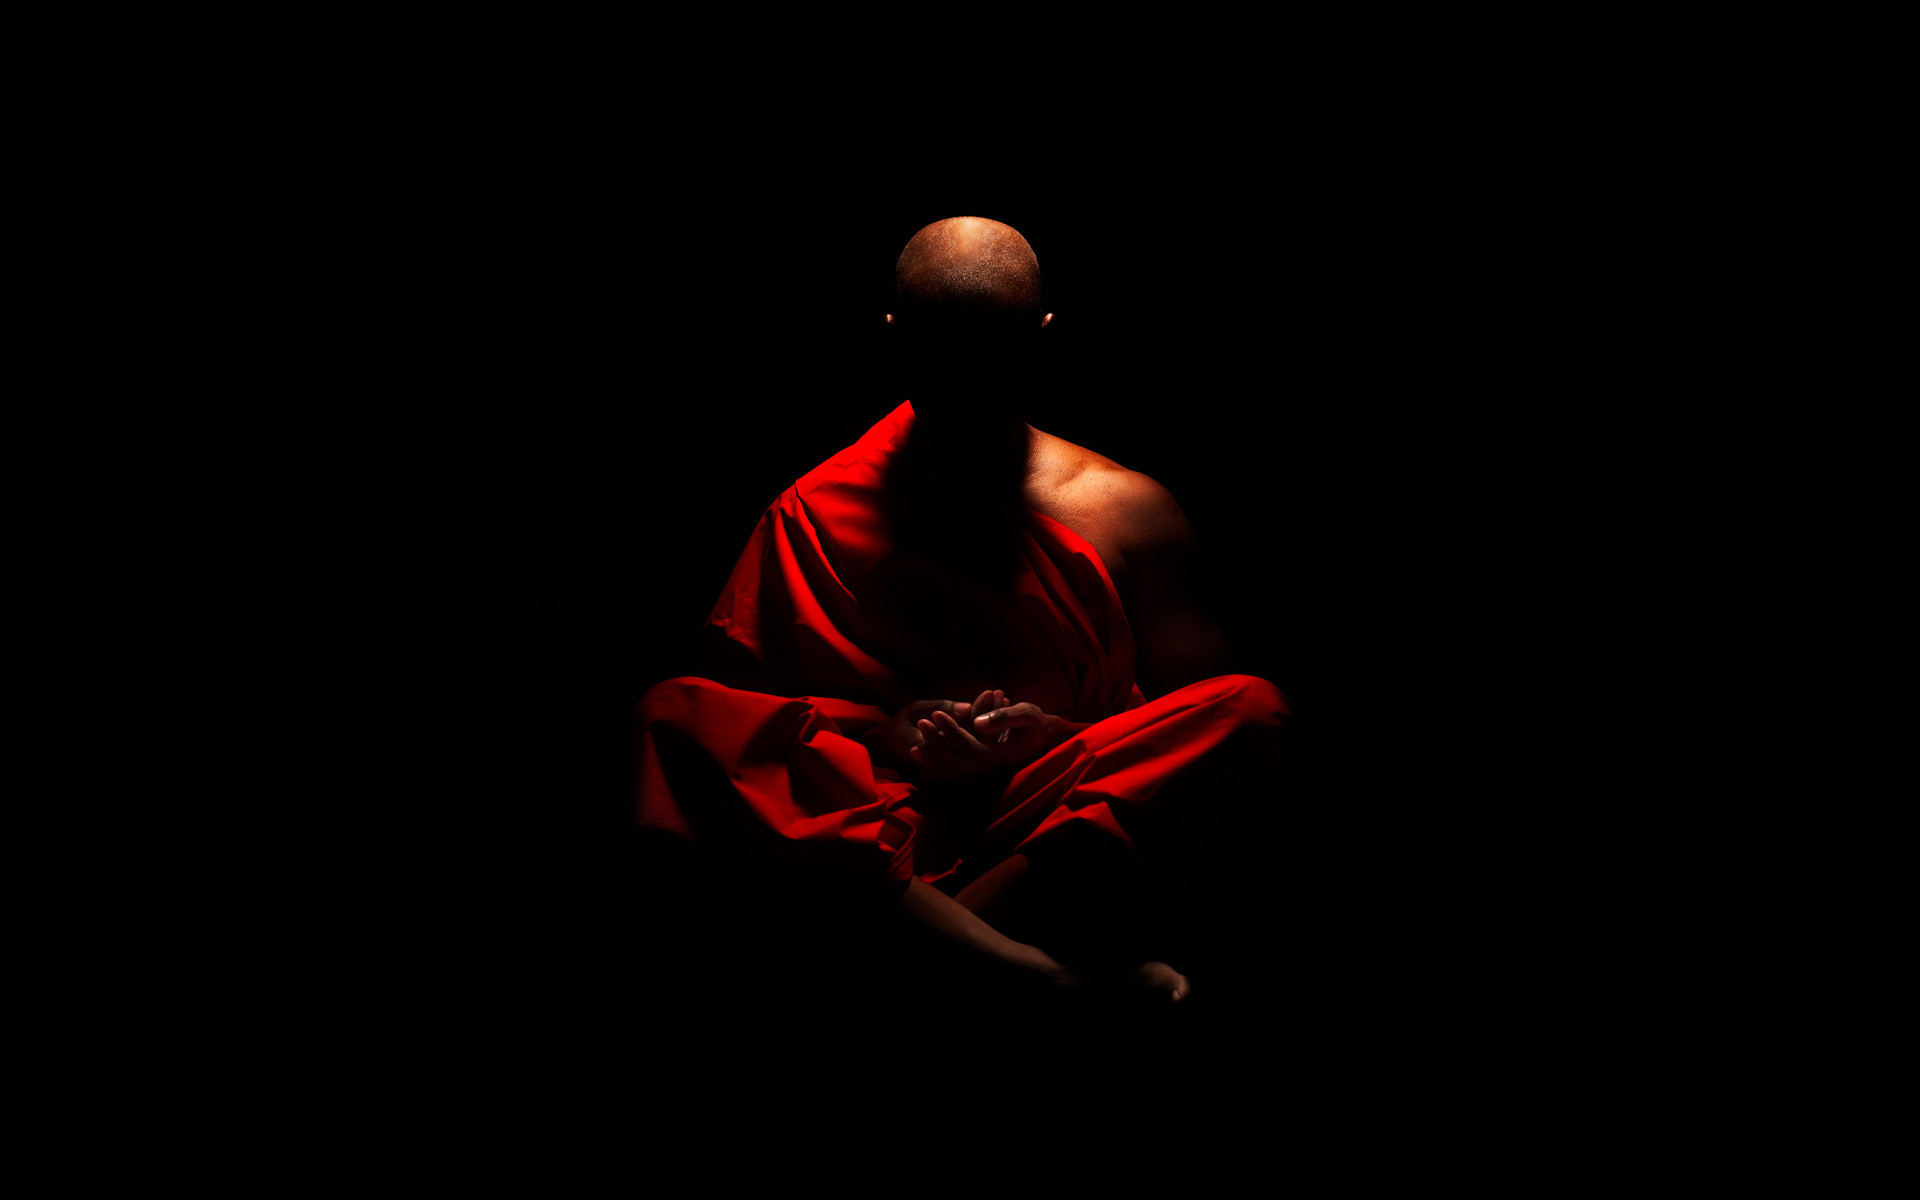 Meditation Buddhism monk religion robe zen wallpaper   .